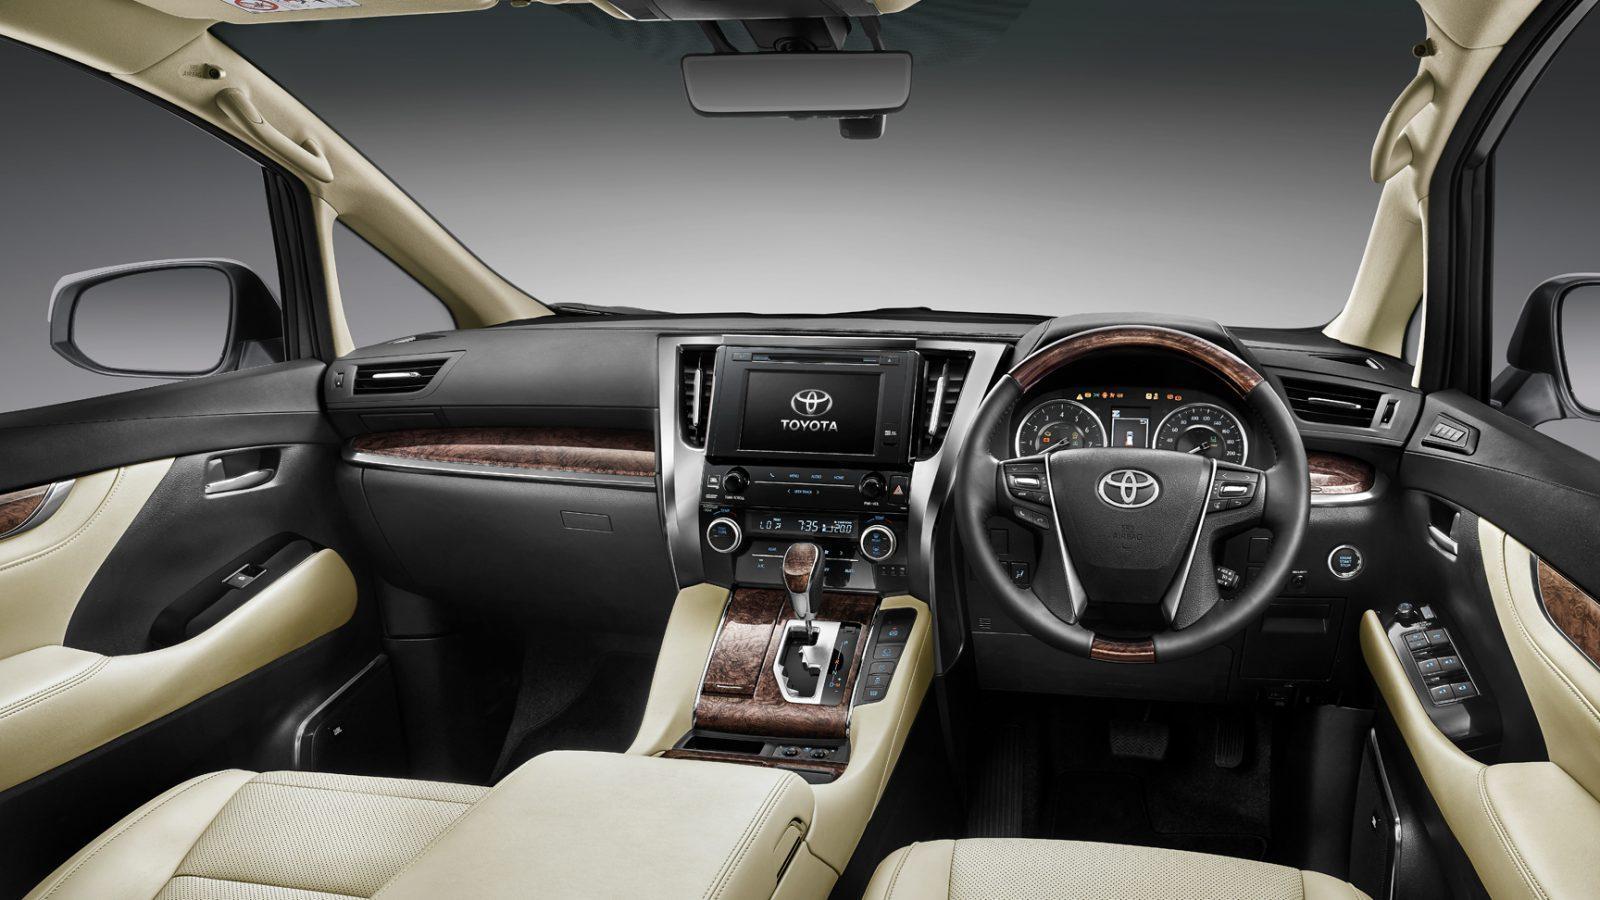 Toyota Vellfire Vs Alphard: Understanding Both Creations - CAR FROM